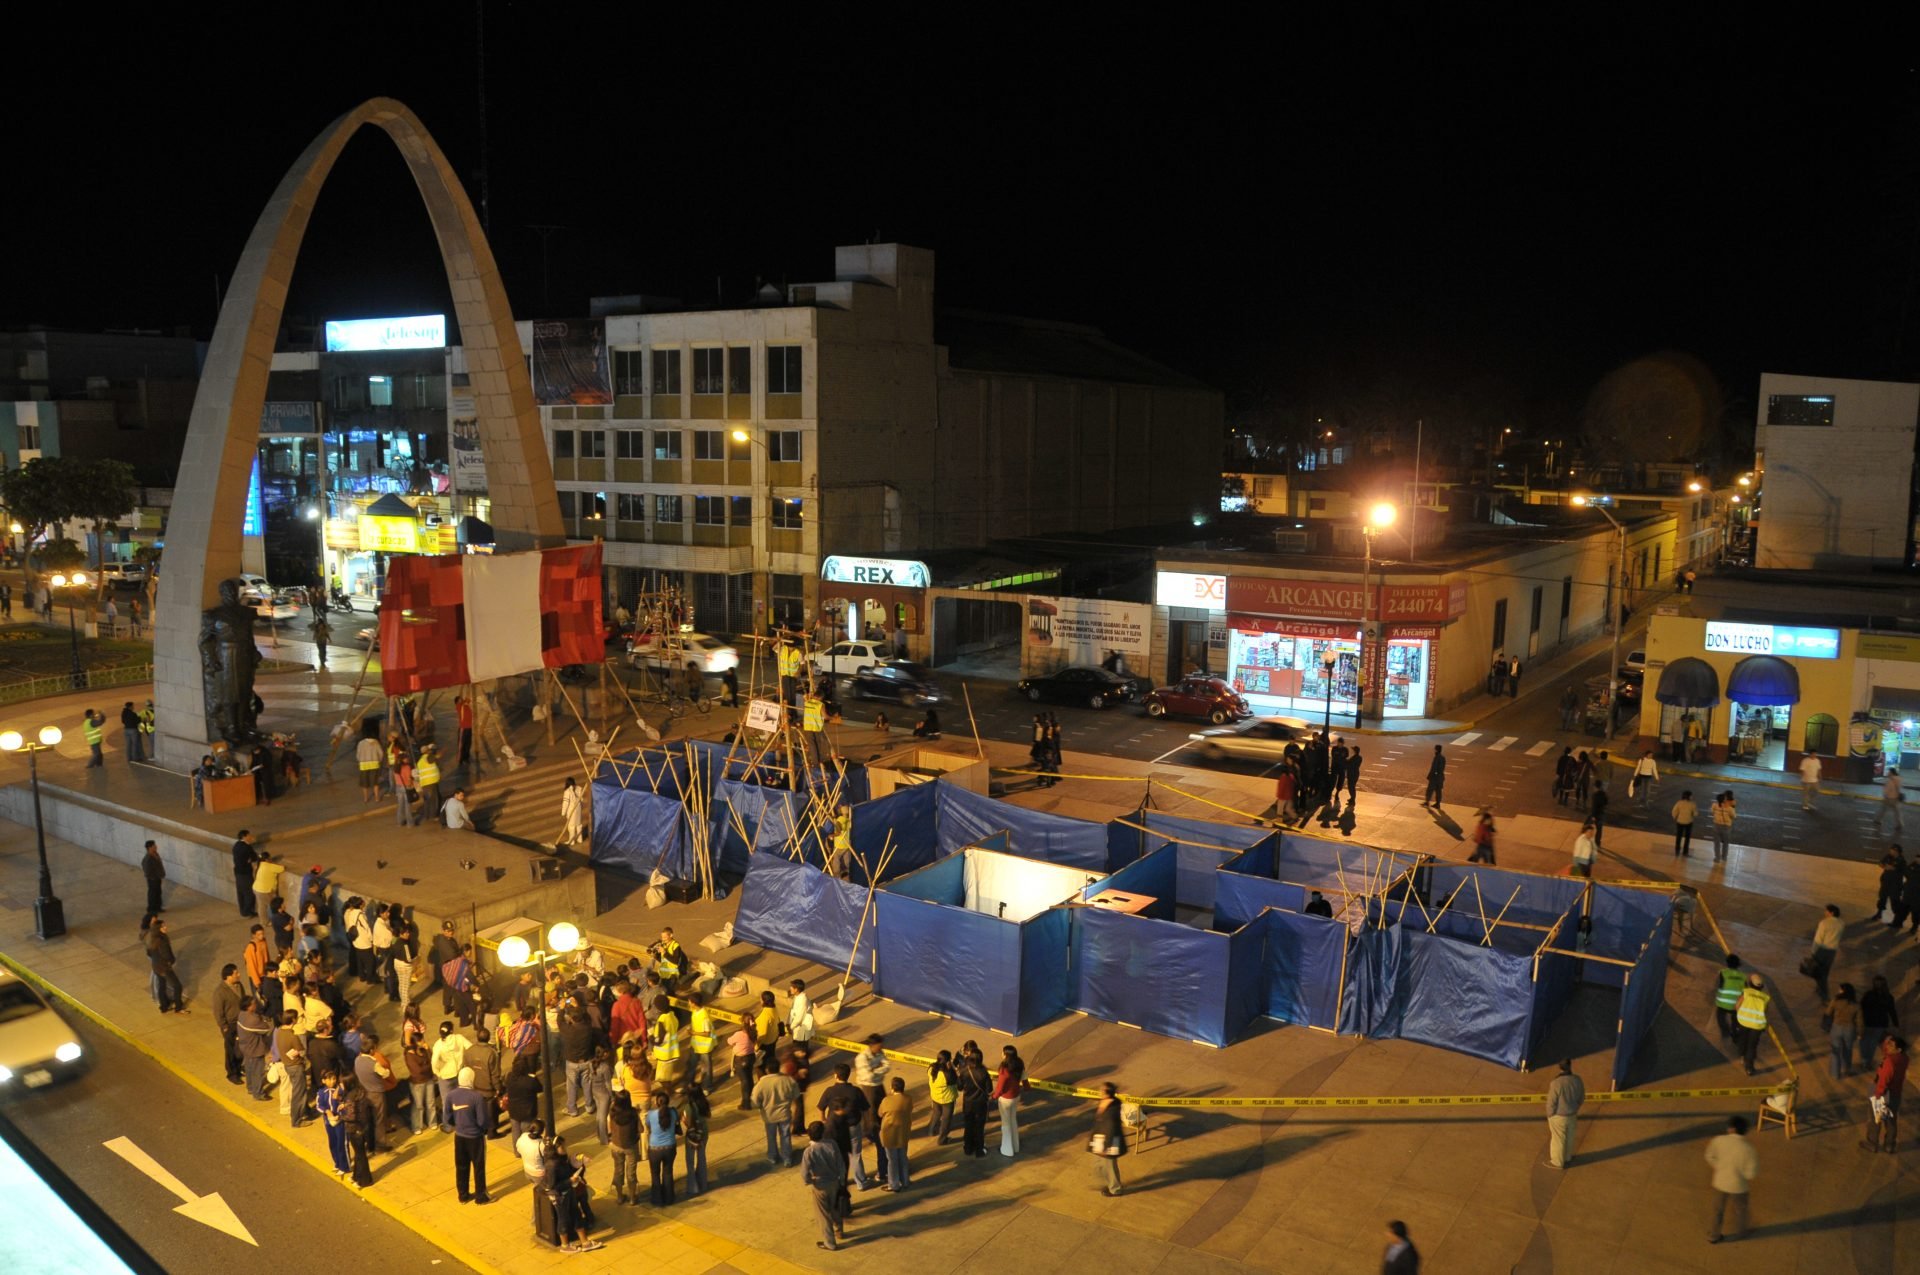 2008_peru_desierto_present2_plaza_dearmastacna_3